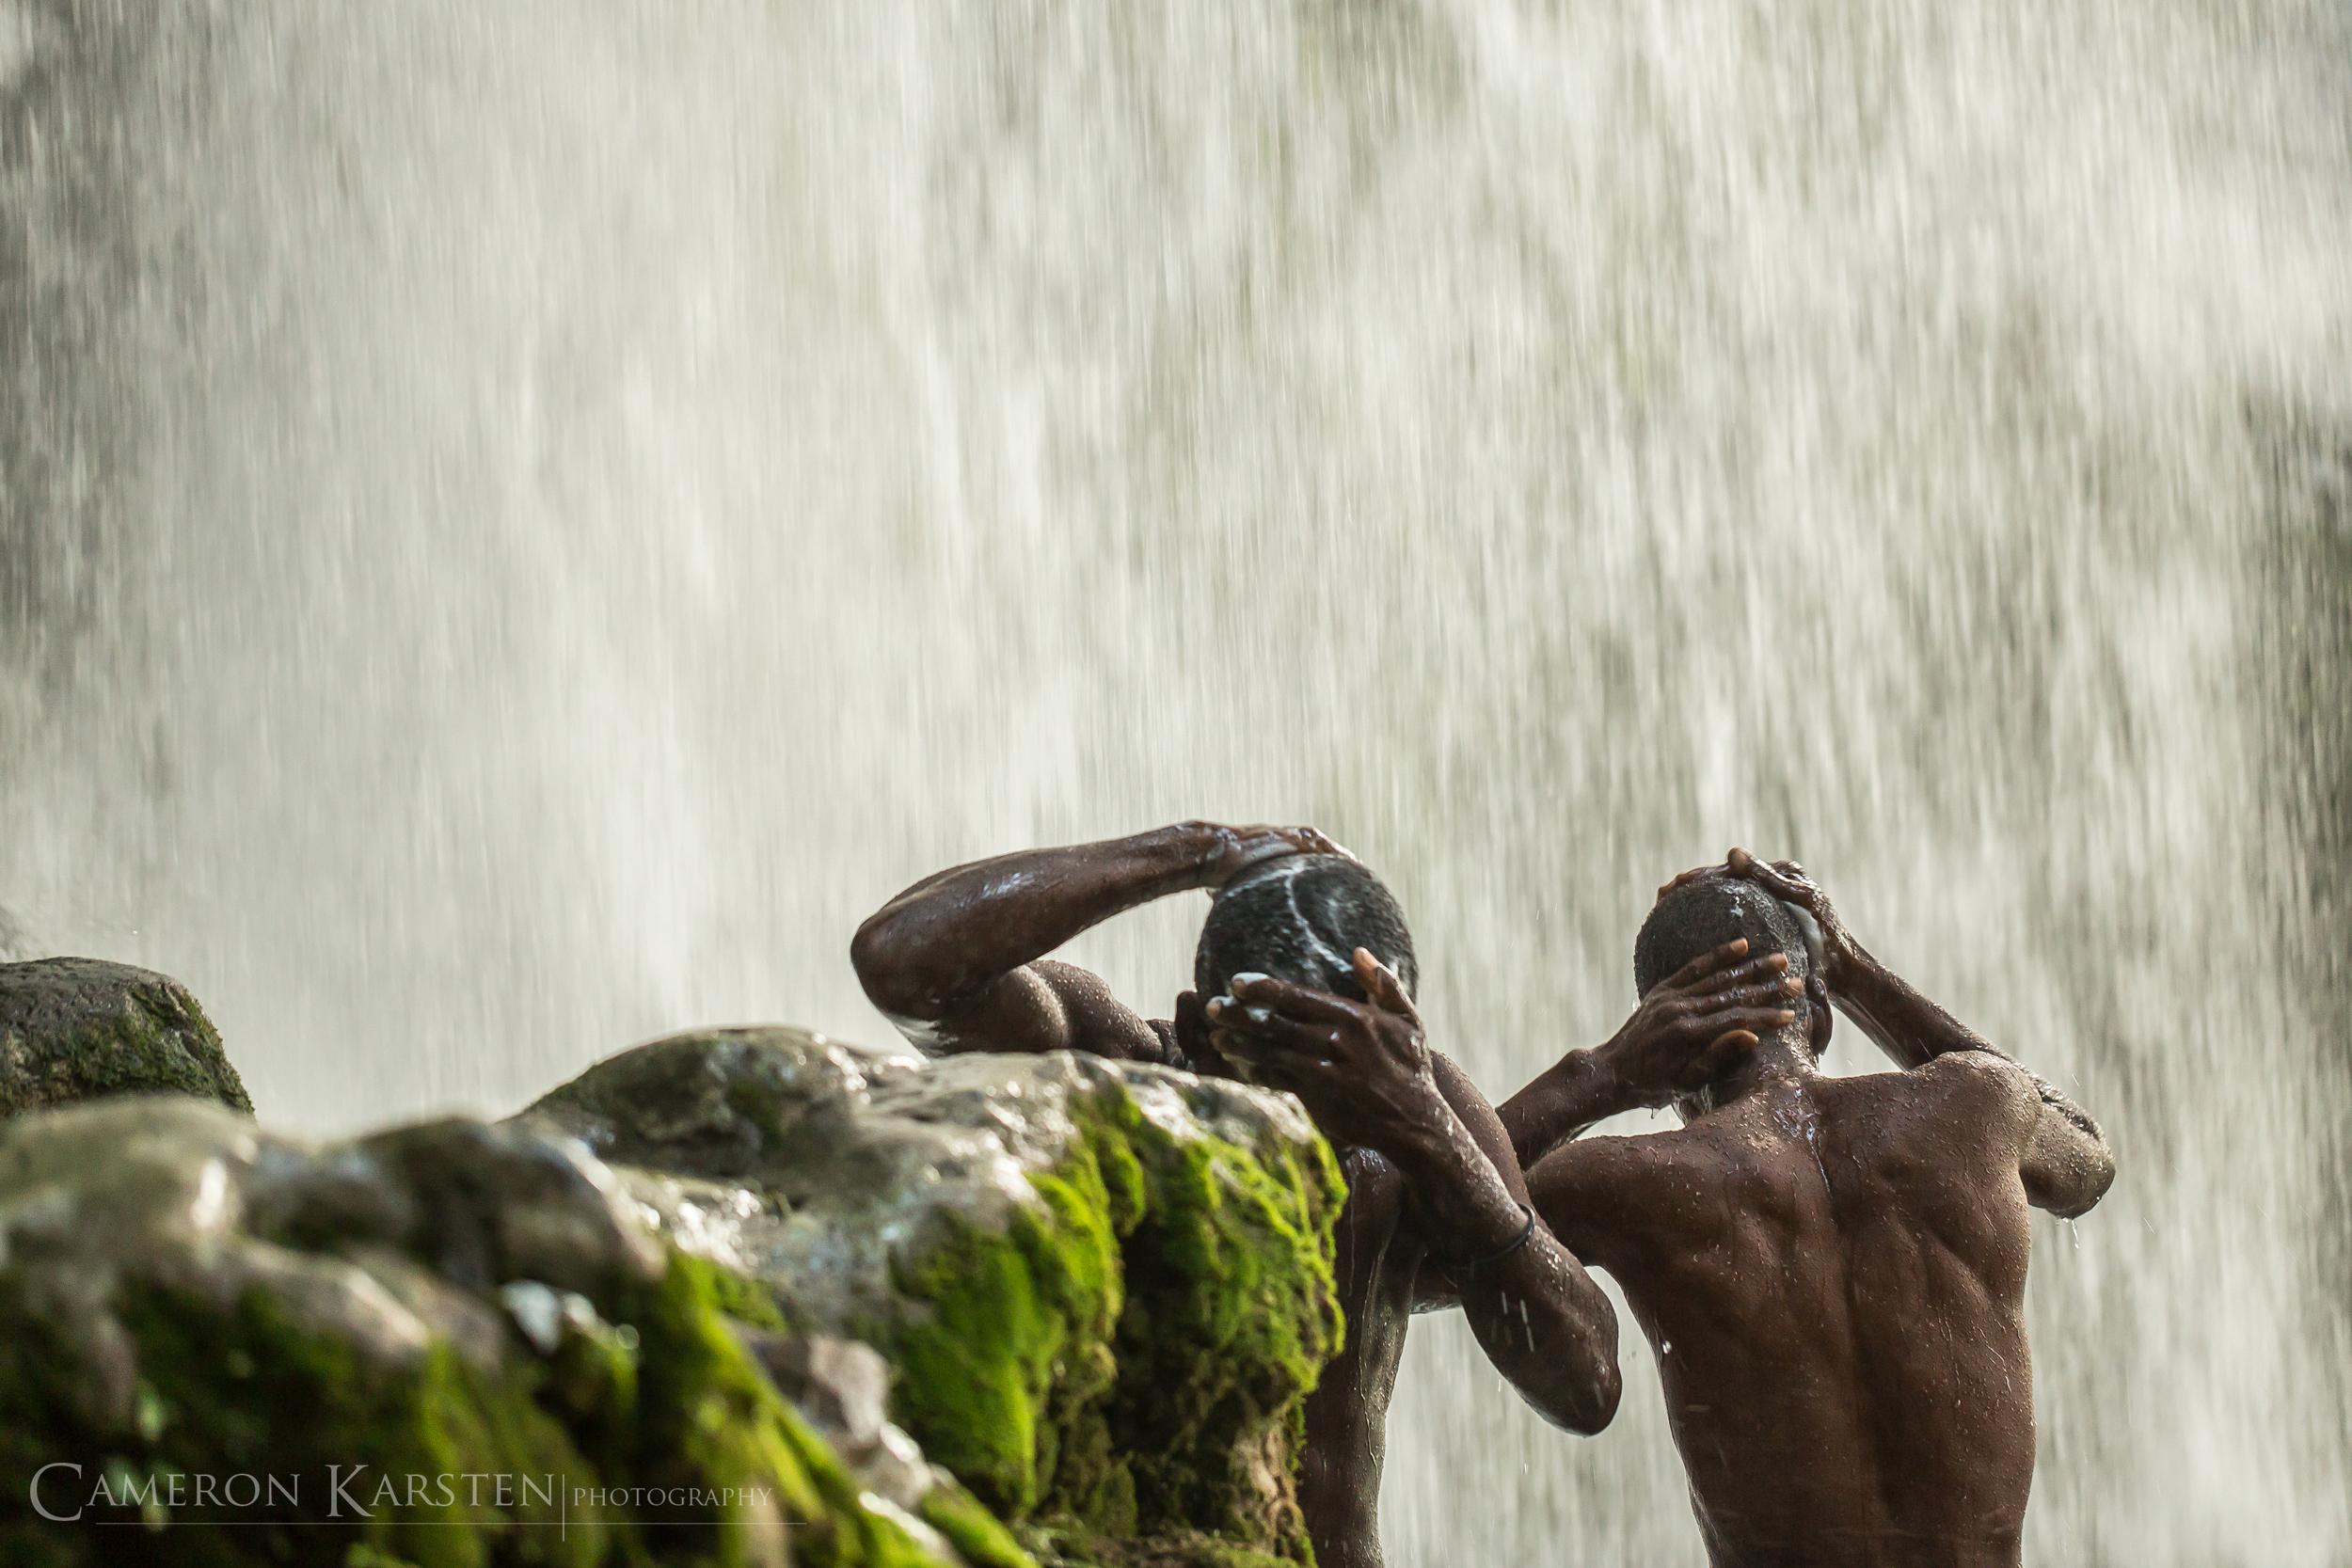 The Vodou Trail in Haiti exploring the ceremonies and rituals of Haitian Vodou